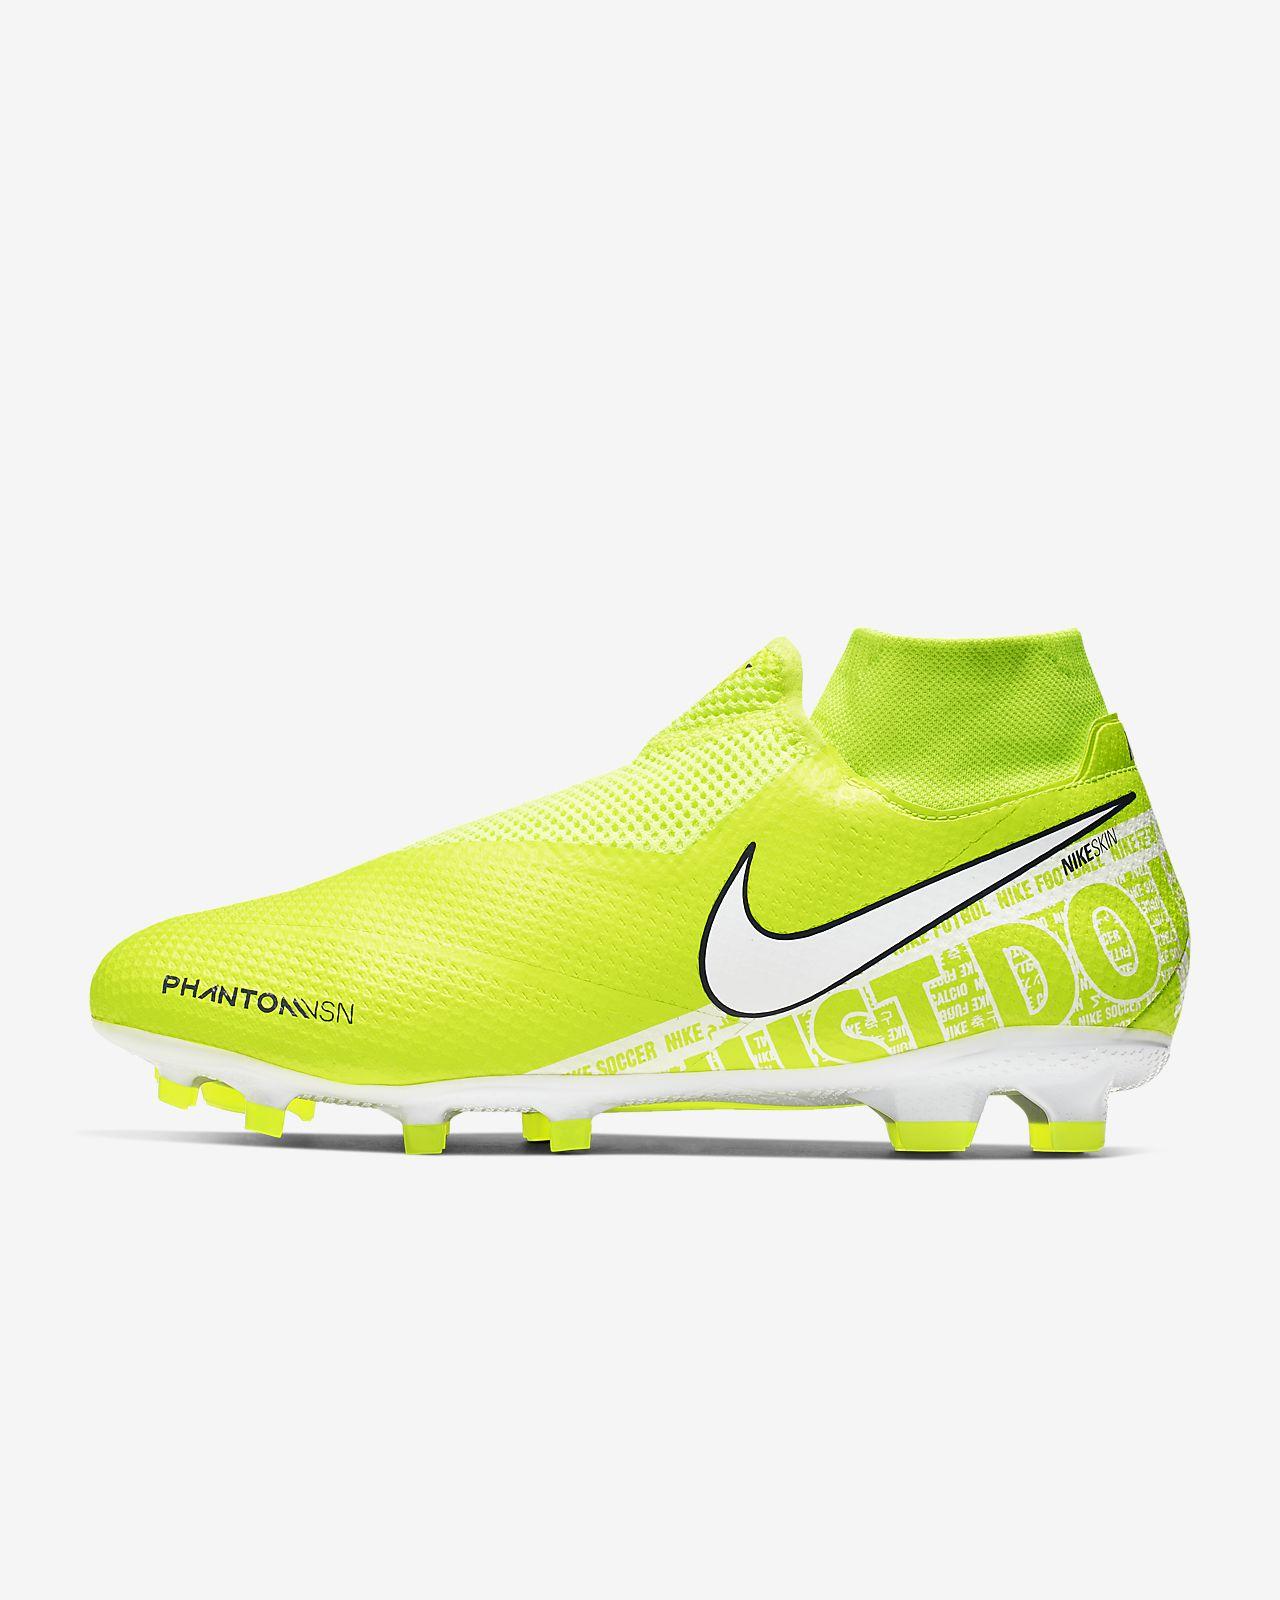 Nike Phantom Vision Pro Dynamic Fit FG Botas de fútbol para terreno firme